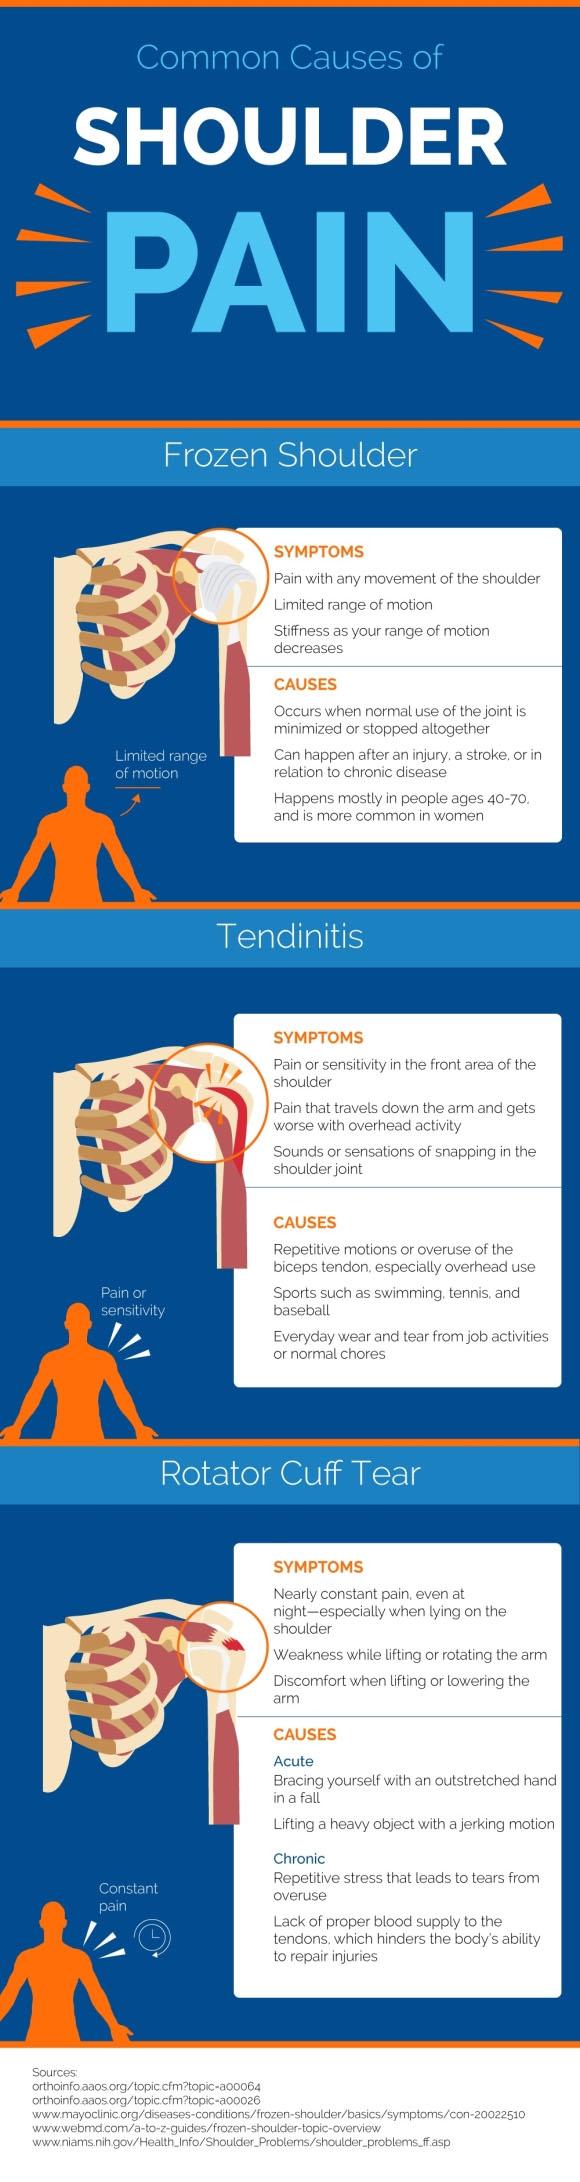 Understand shoulder pain including shoulder tendinitis, frozen shoulders, and rotator cuff tears